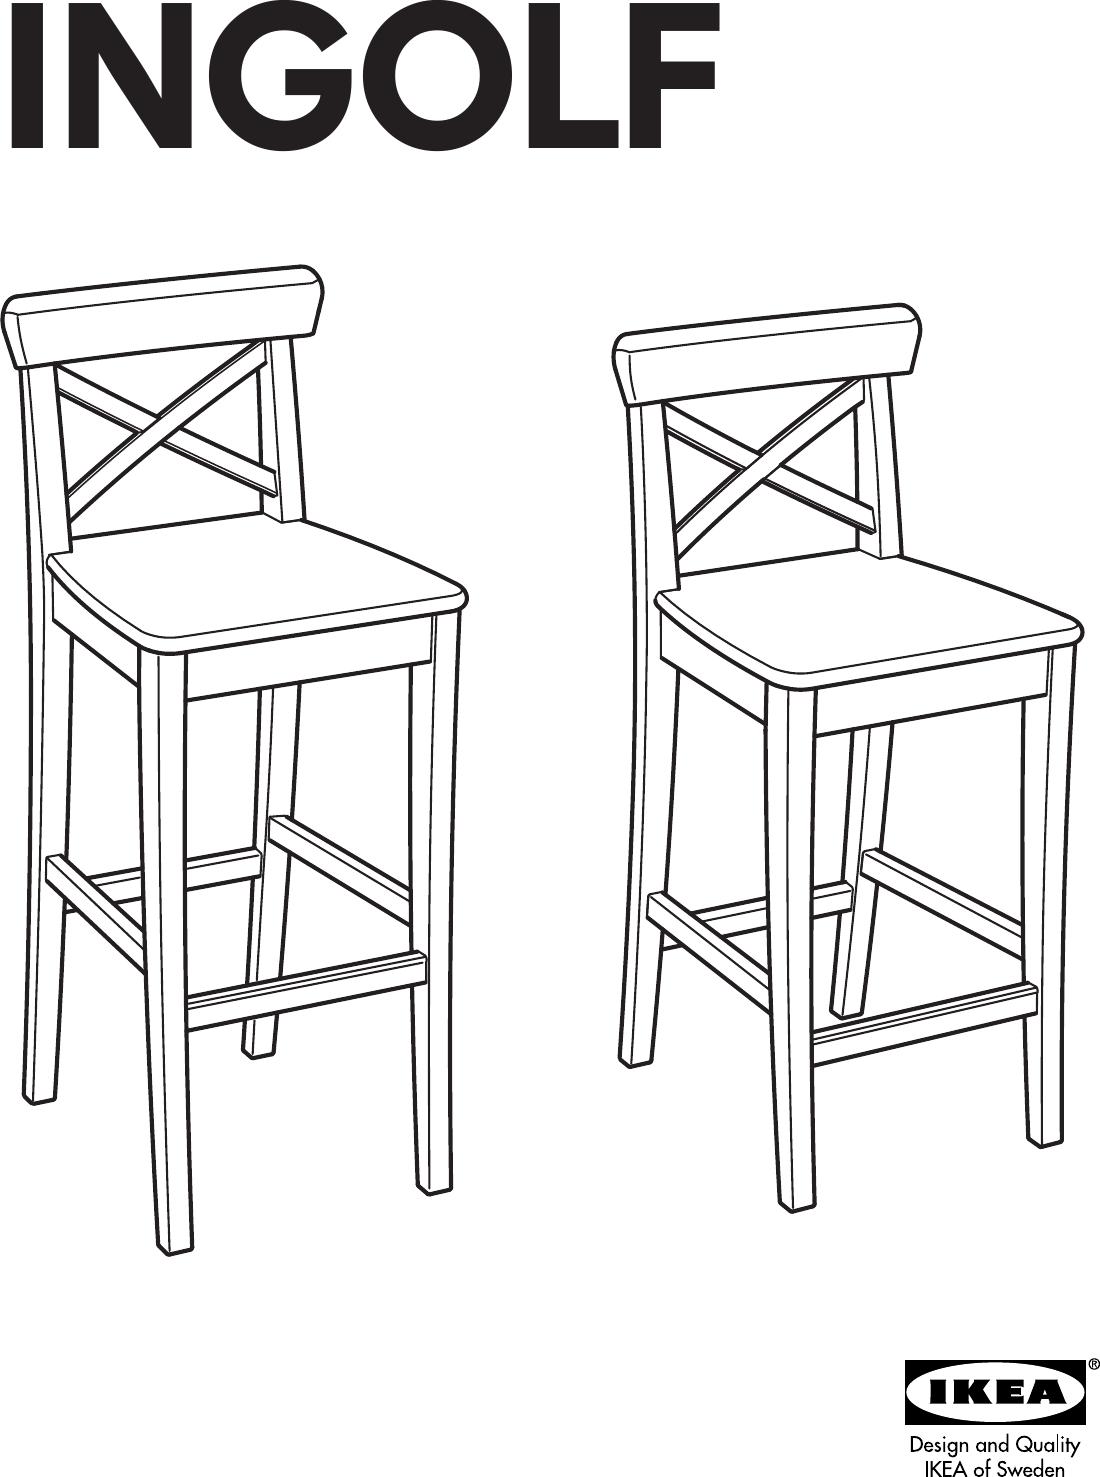 Sensational Ikea Ingolf Bar Stool W Backrst 29 1 8 Assembly Instruction Andrewgaddart Wooden Chair Designs For Living Room Andrewgaddartcom